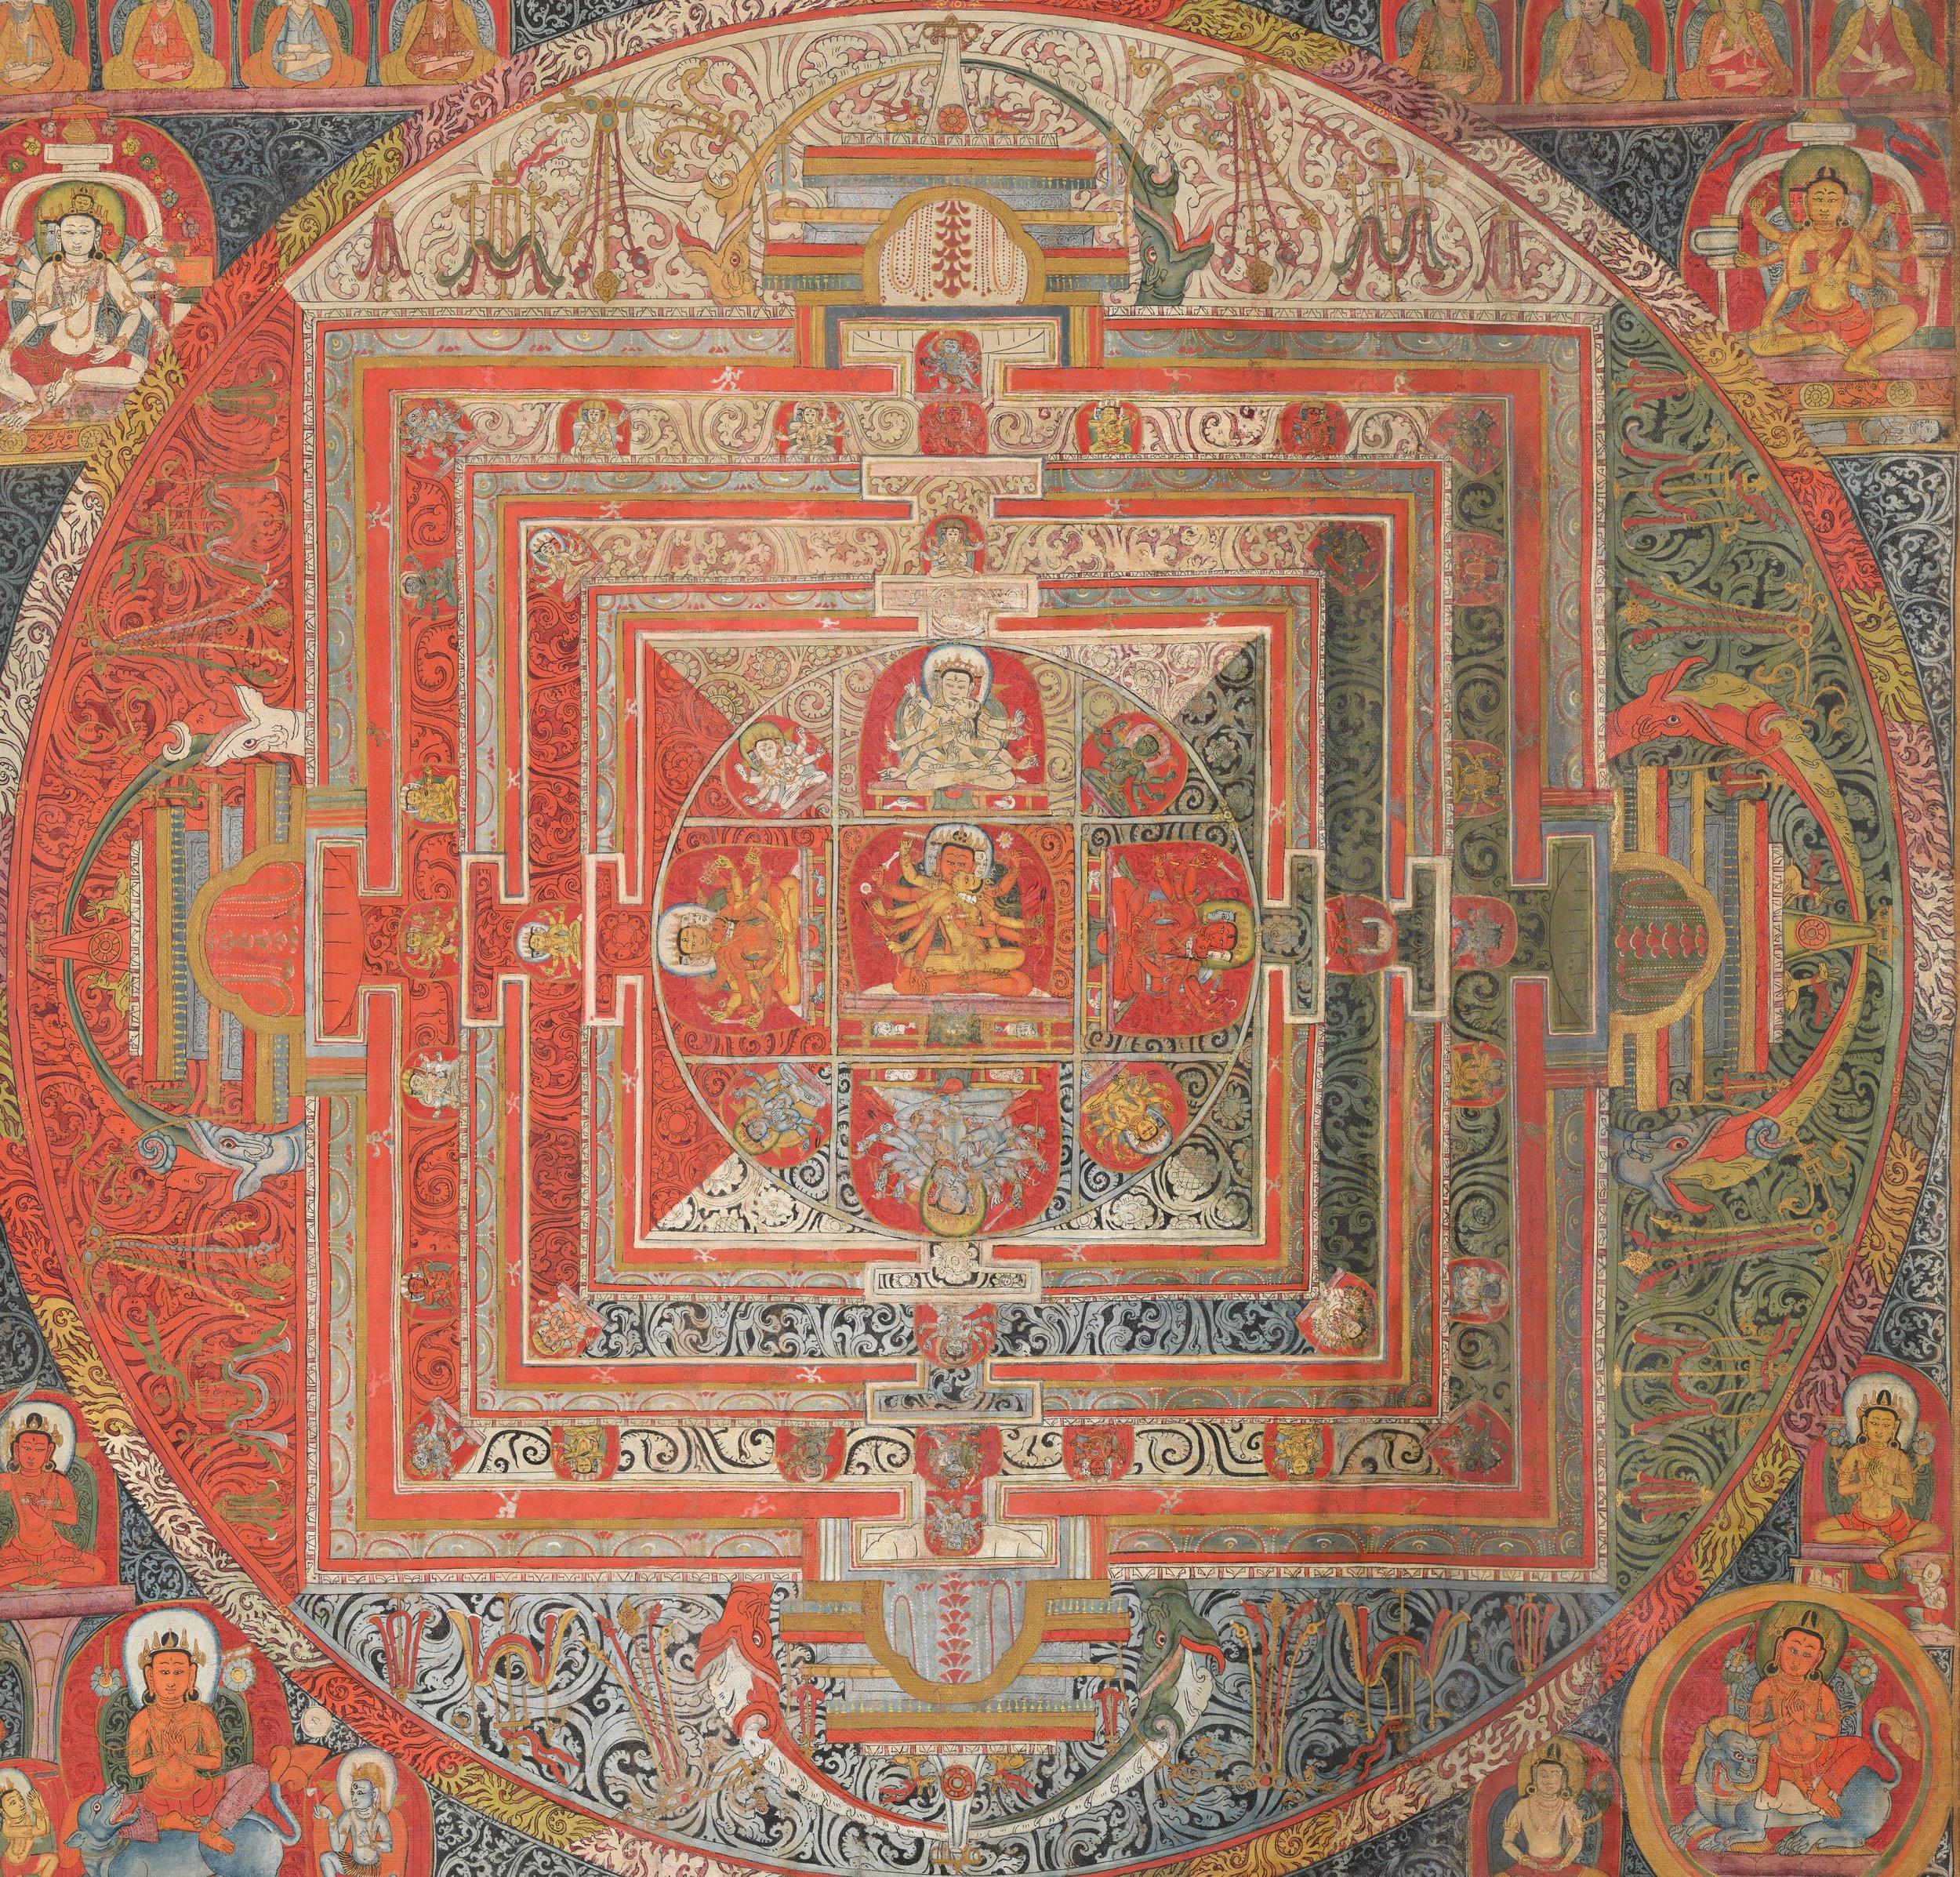 Manjuvajramandala with 43 deities, from Tibet. Tempera on cotton.{{ PD-US }}